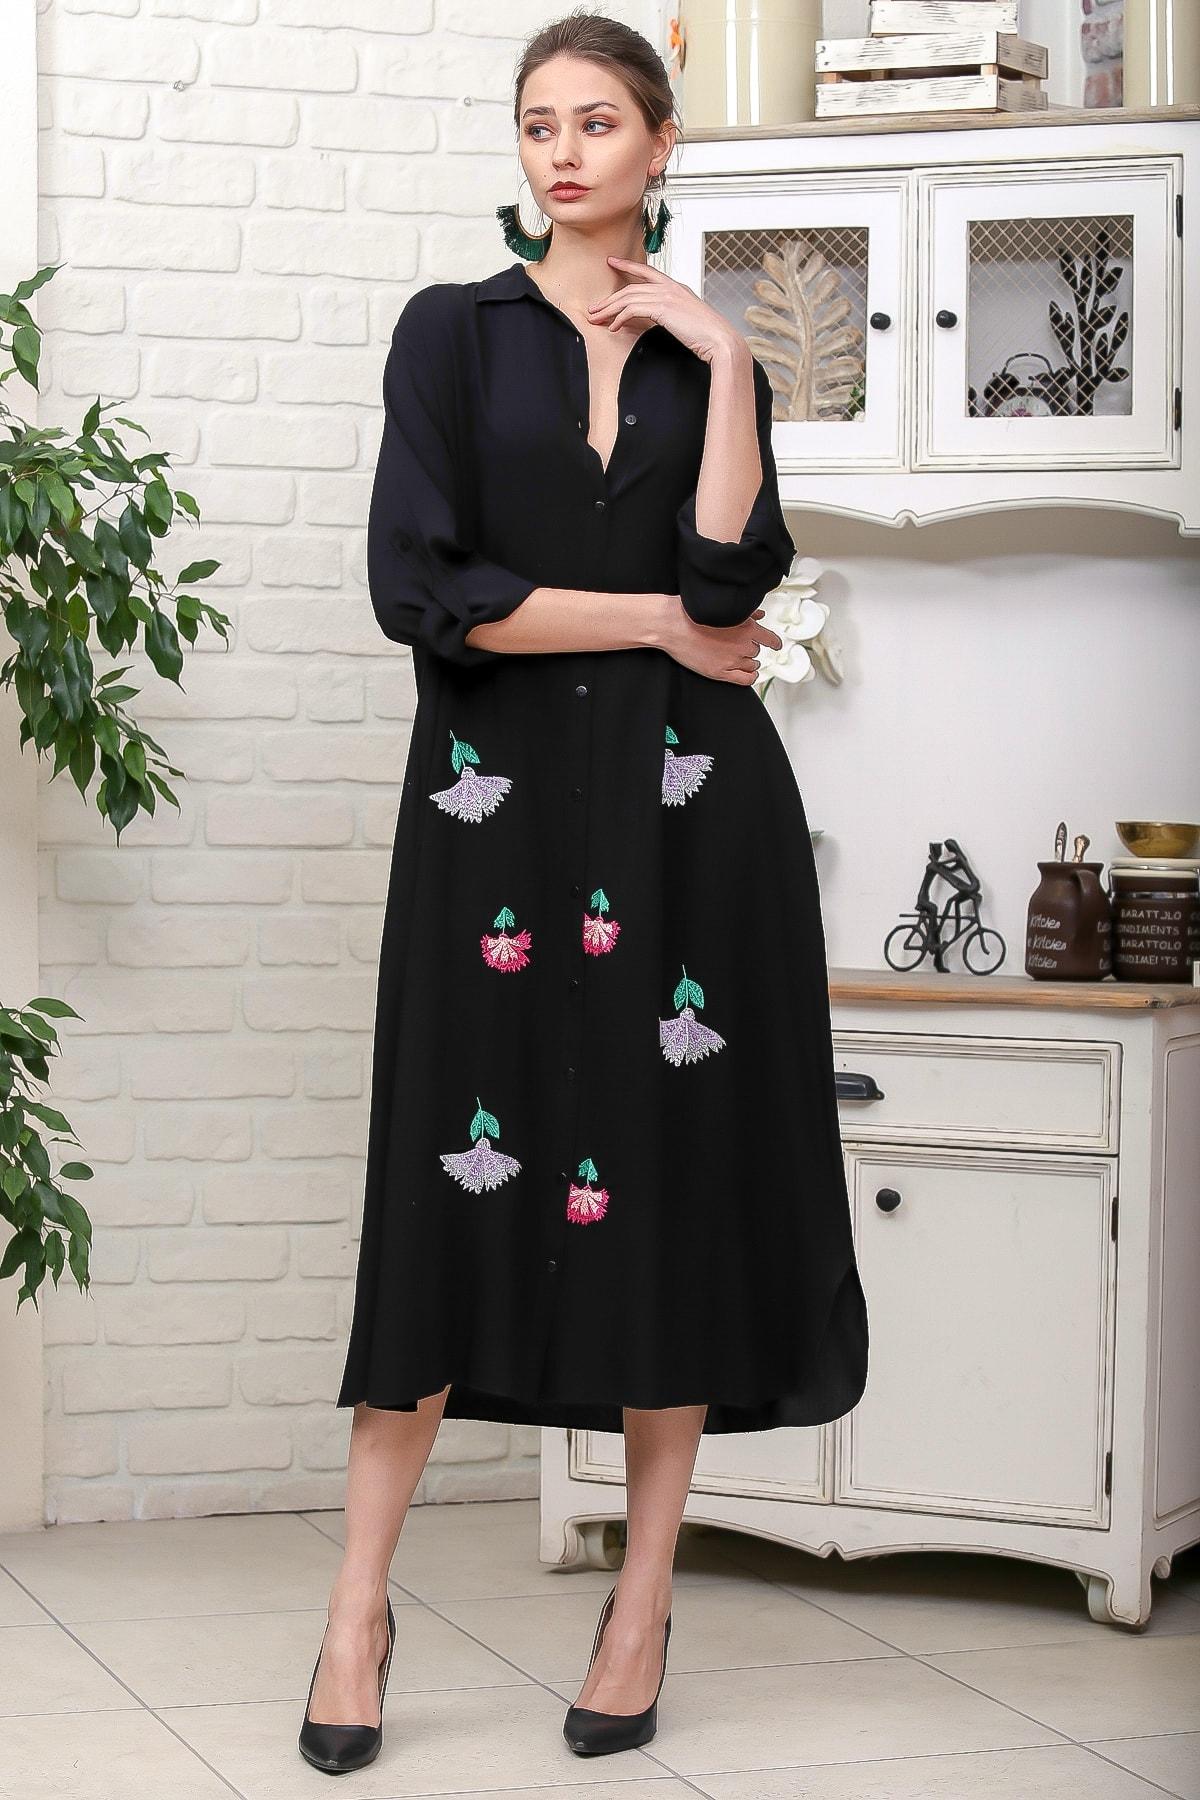 Chiccy Kadın Siyah Karanfil Nakışlı Sırt Detaylı Düğmeli Salaş Gömlek Elbise M10160000EL95923 1